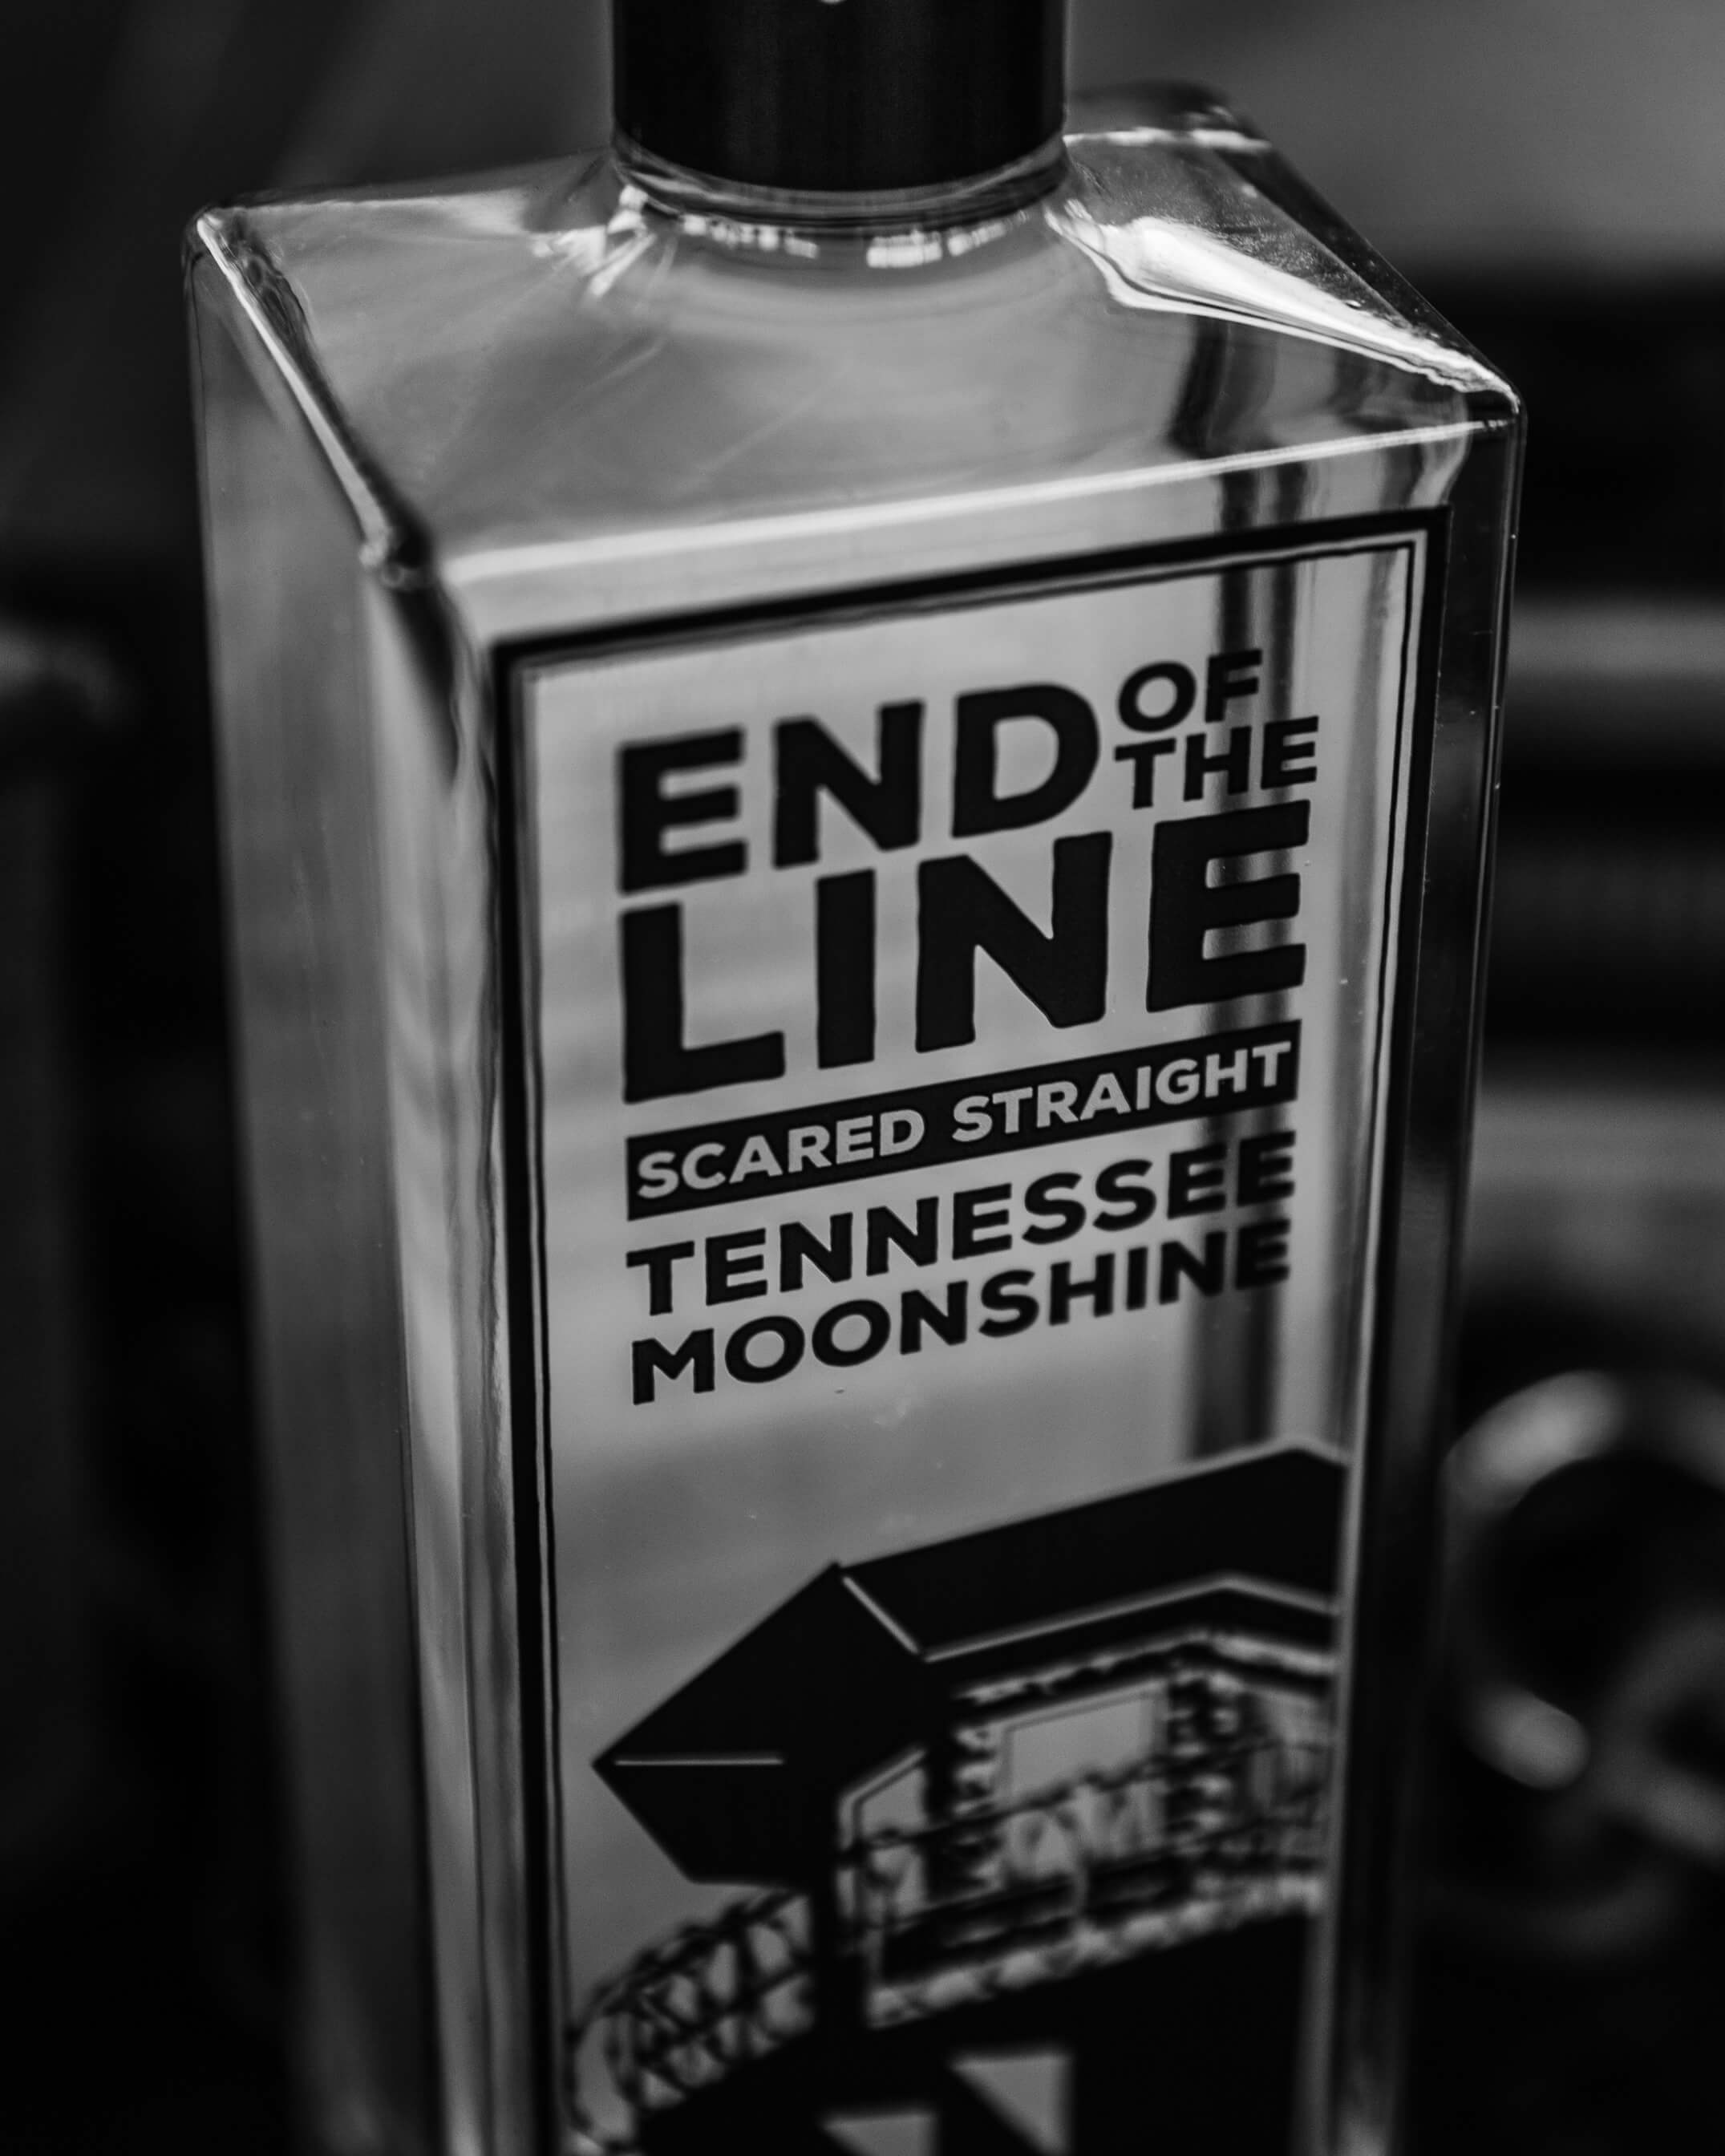 endoftheline-moonshine-scaredstraight-grayscale.jpg